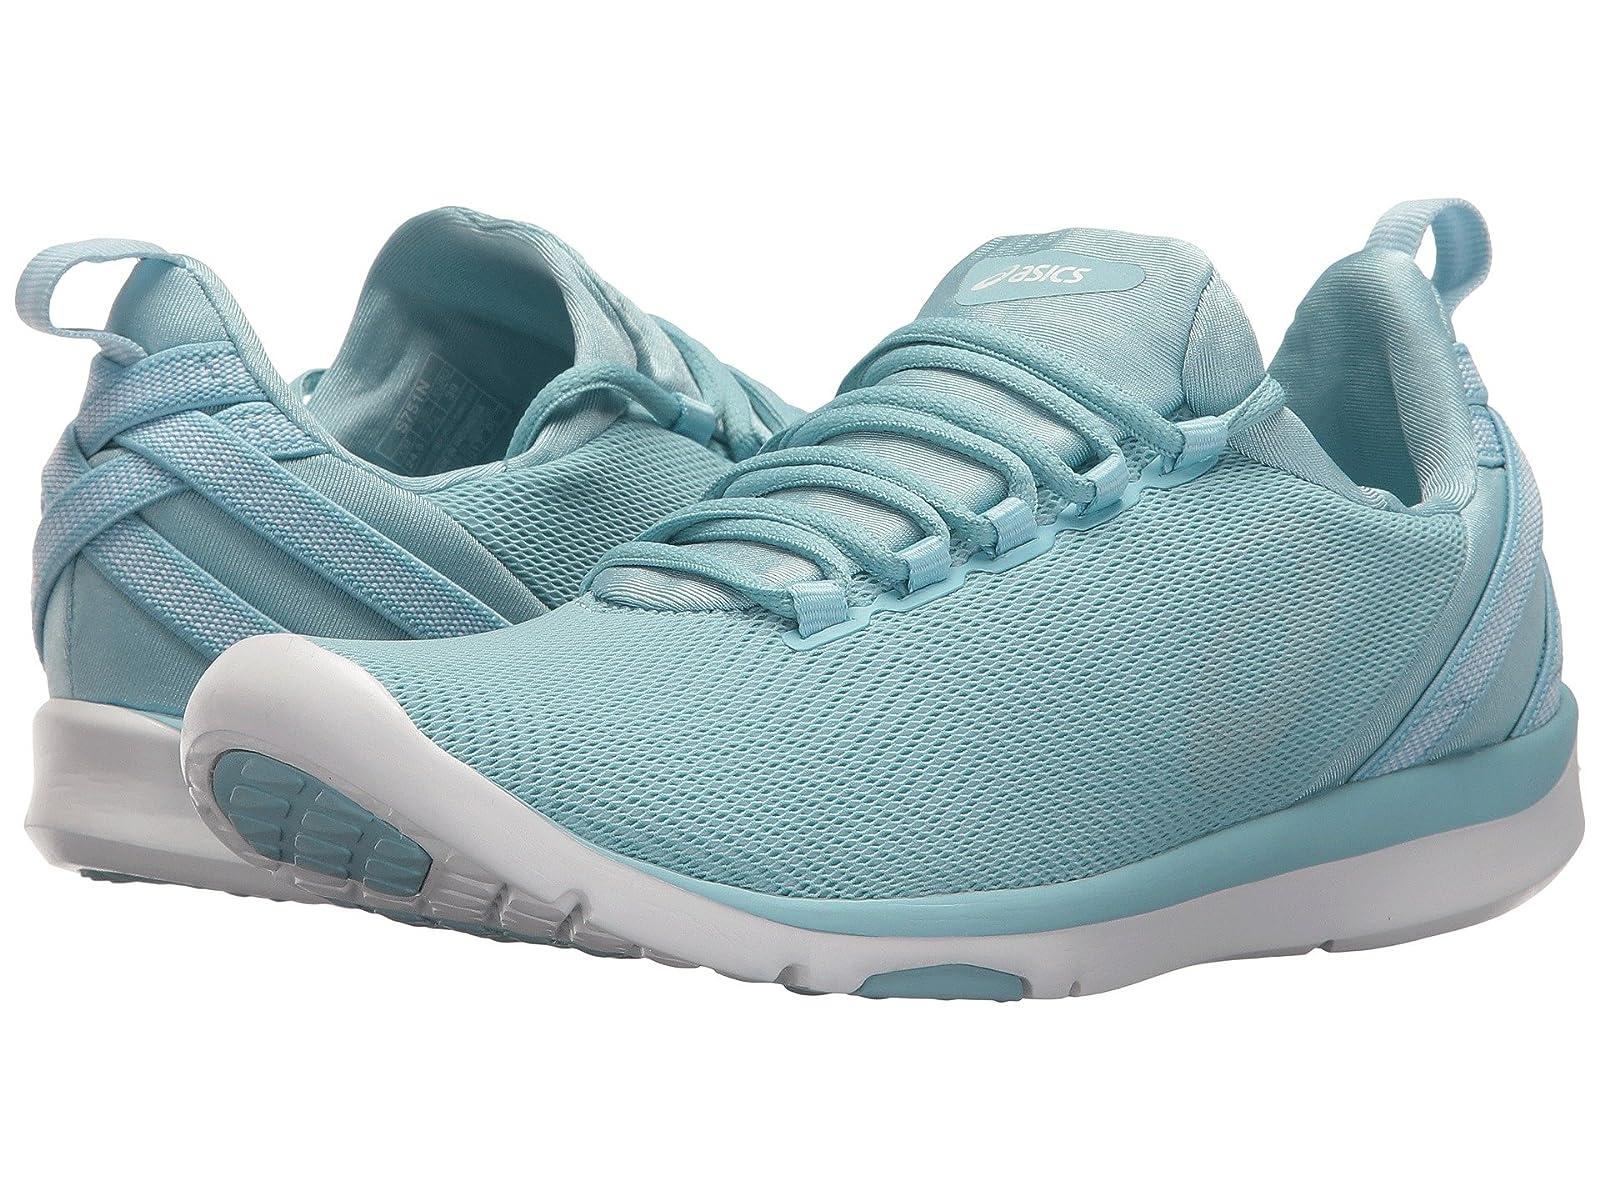 ASICS Gel-Fit Sana 3Atmospheric grades have affordable shoes